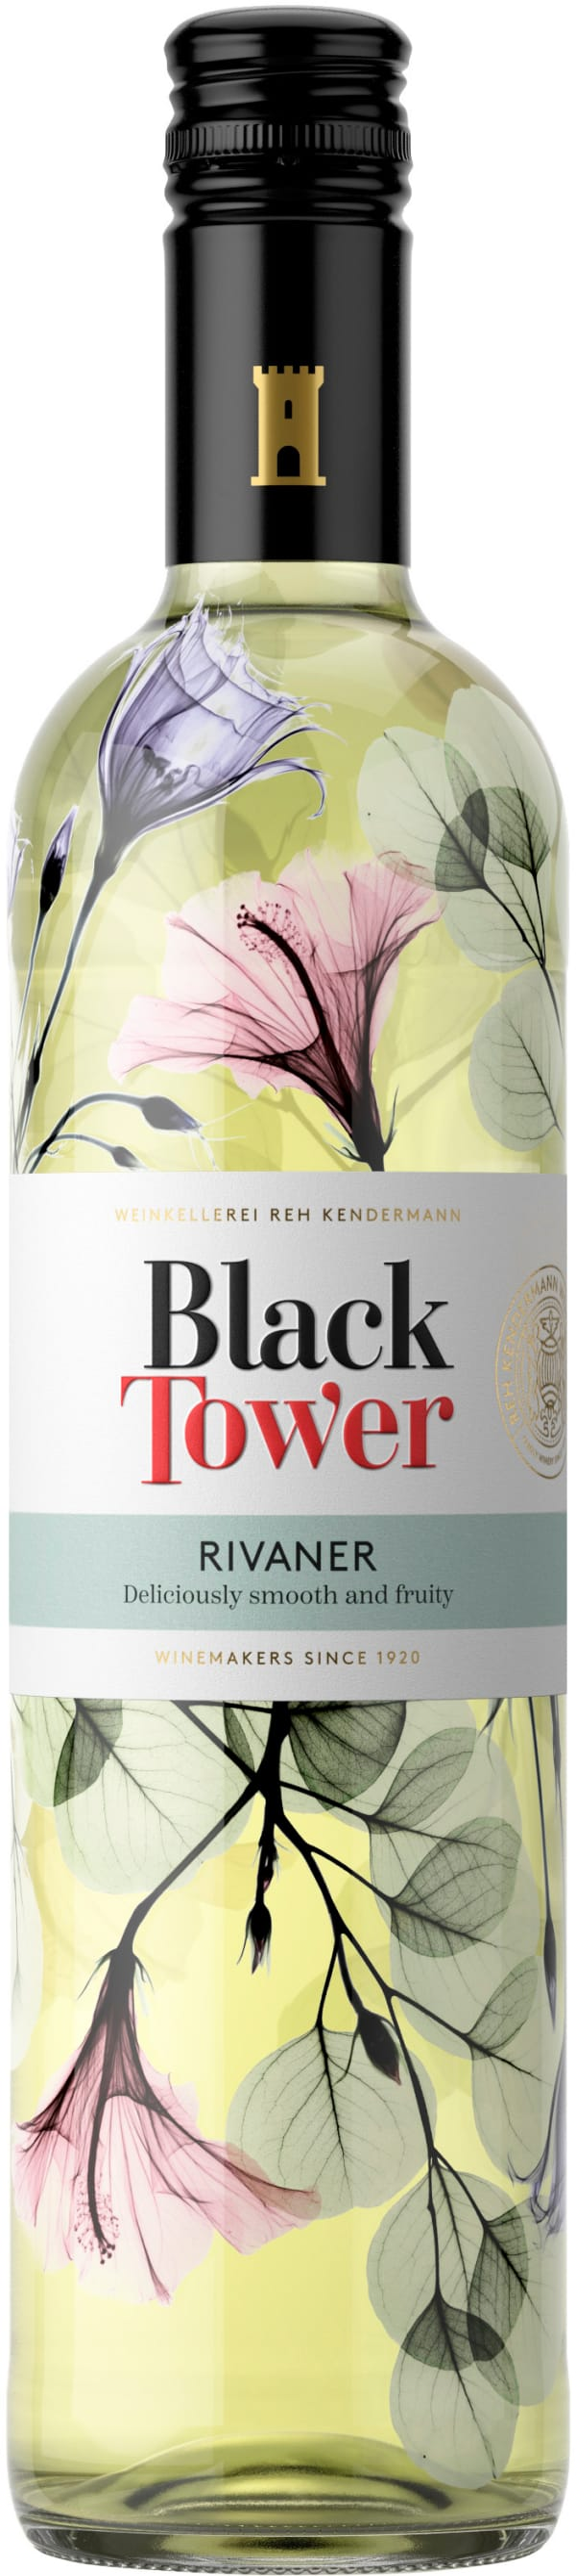 Black Tower Rivaner 2017